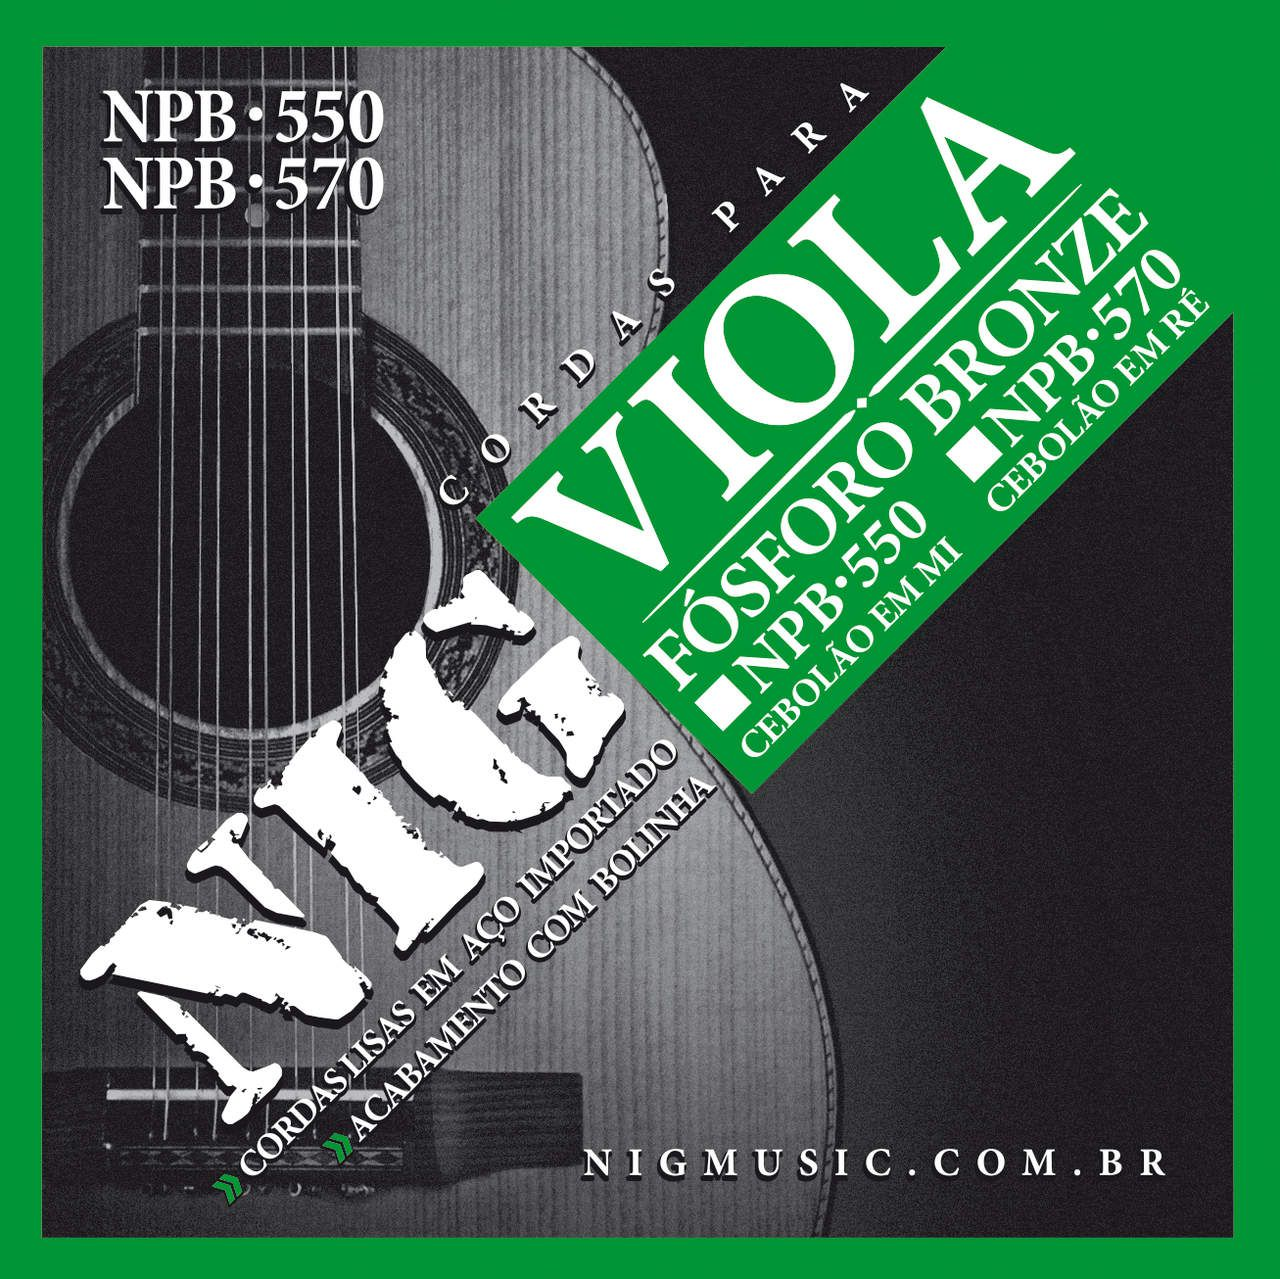 Encordoamento Viola Nig Fósforo Bronze Cebolão em MI NPB550